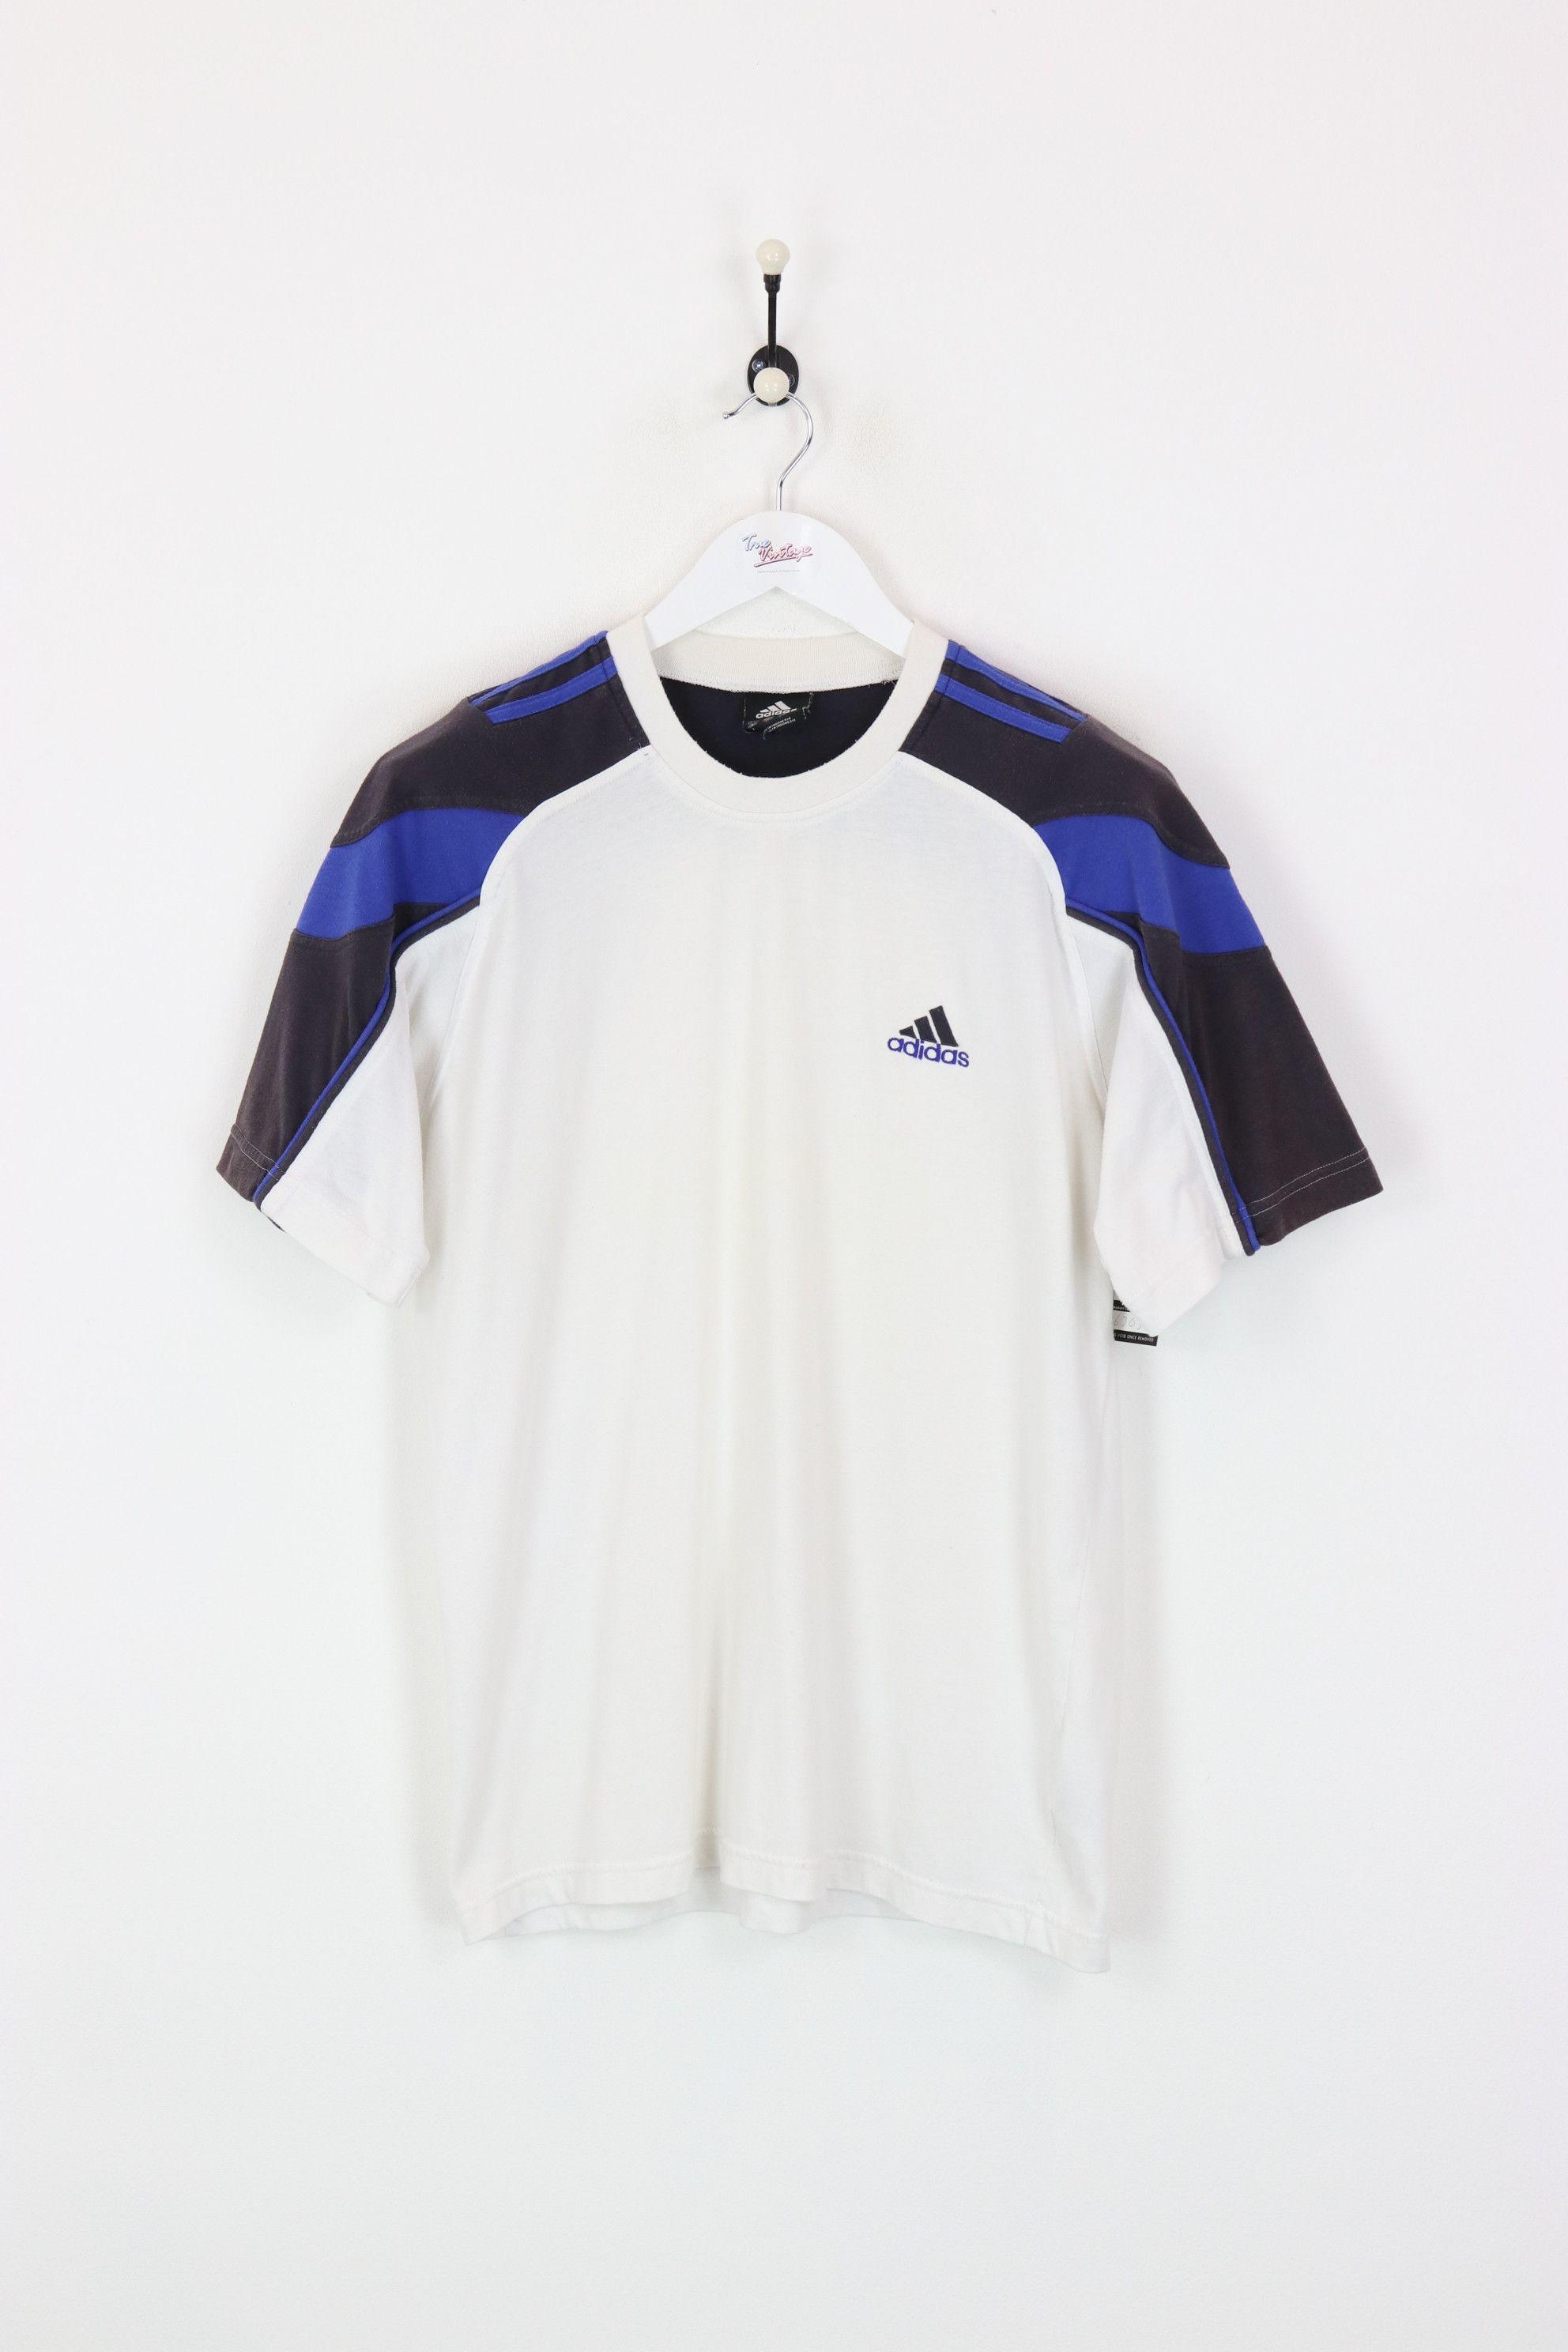 Adidas T-shirt White/Blue Medium